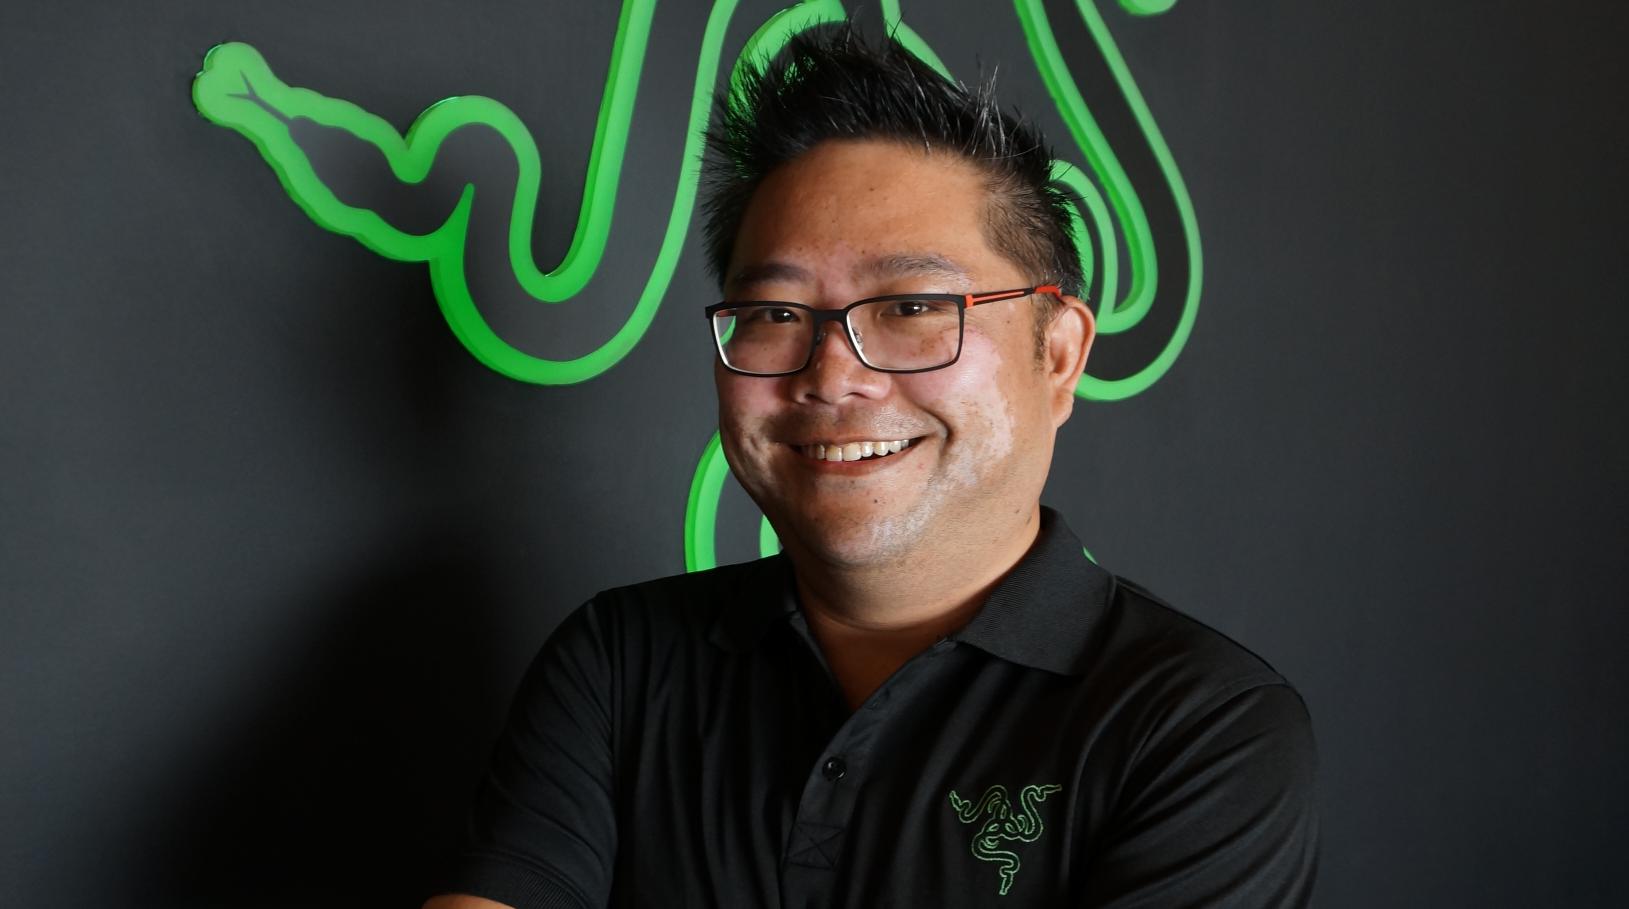 Razer Fintech's CEO Lee Li Meng